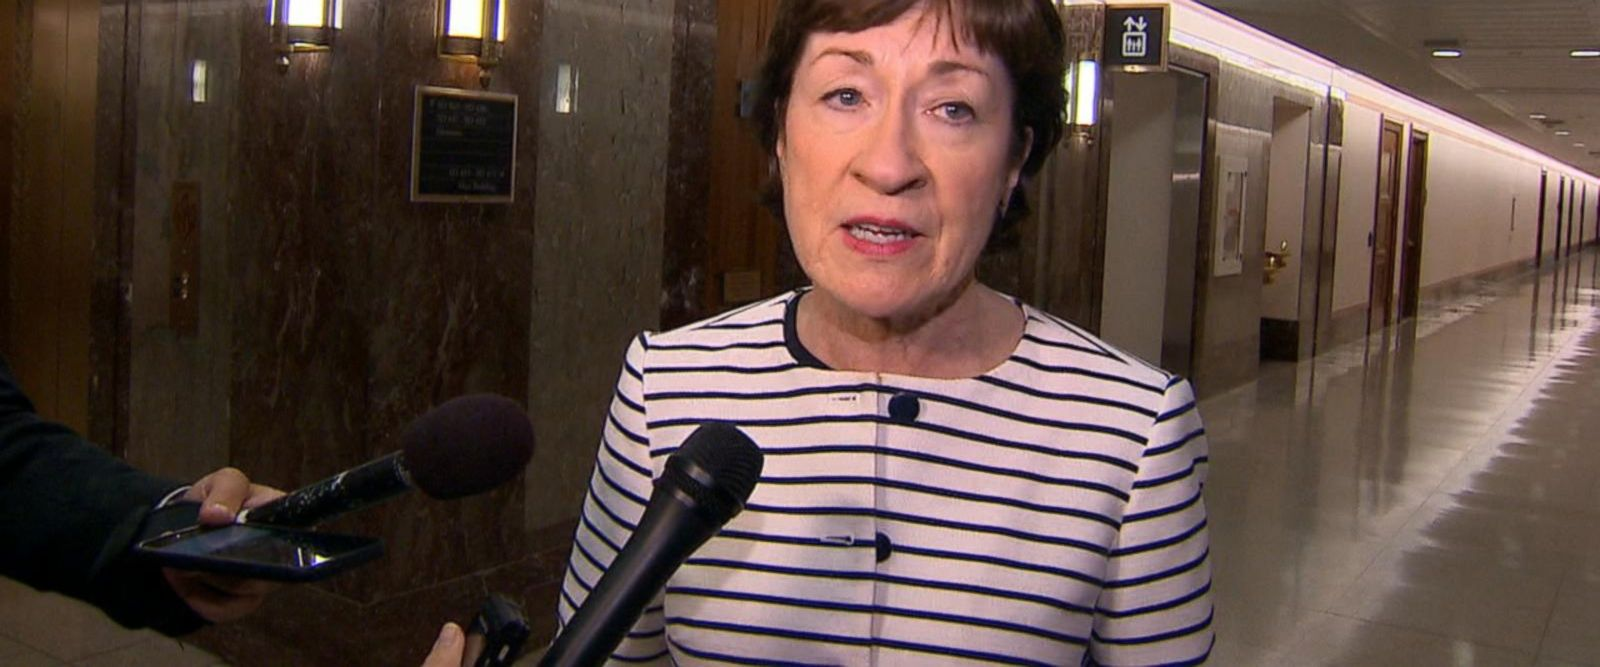 VIDEO: 3rd Republican senator declares 'no' vote on health care